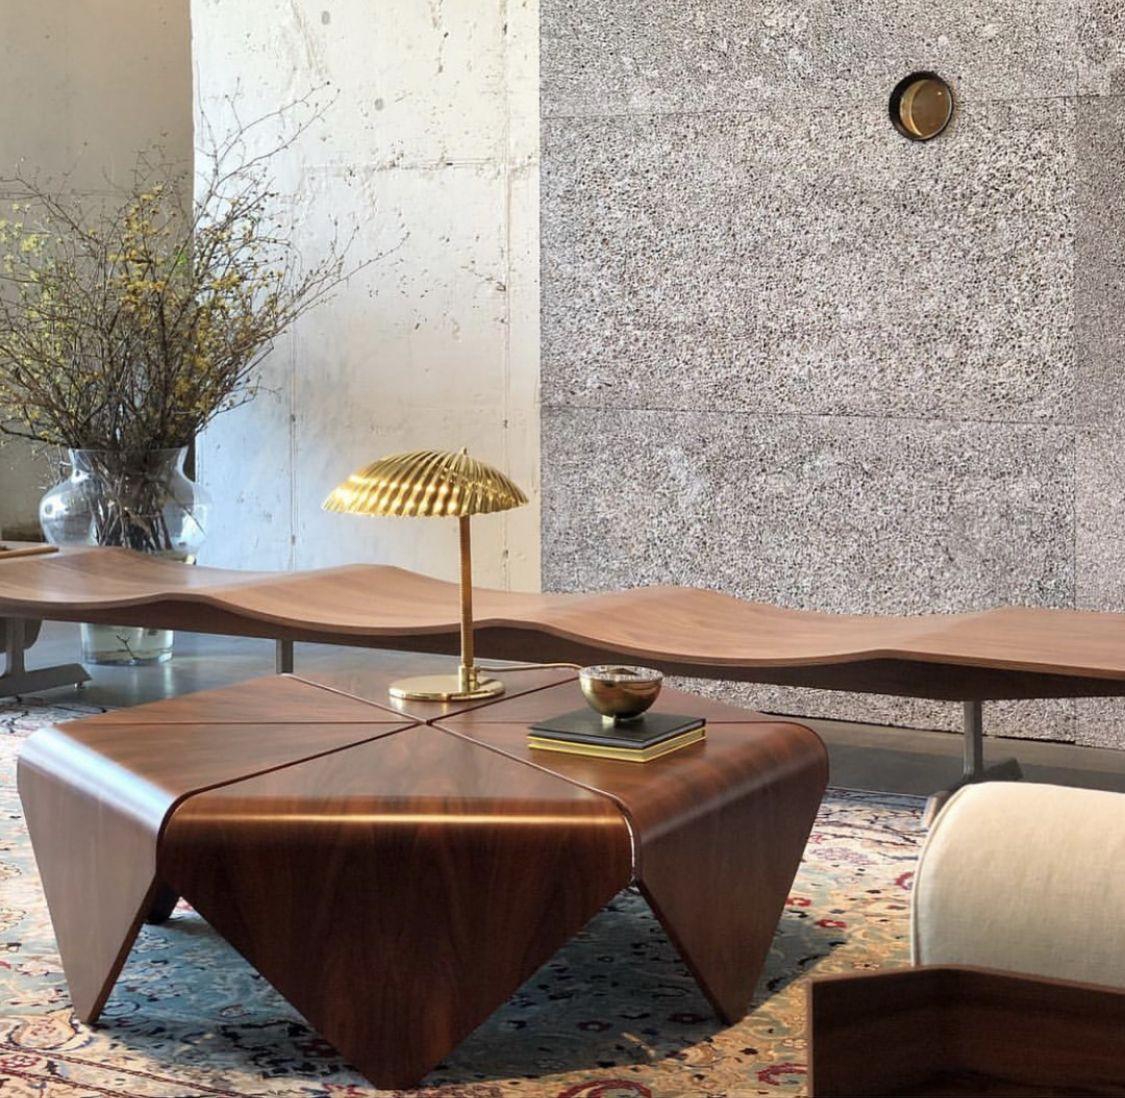 Petalas Coffee Table And Onda Bench By Jorge Zalszupin Available At Espasso Midcentury Modern Brazilian De Furniture Design Decor Interior Design Center Table [ 1098 x 1125 Pixel ]